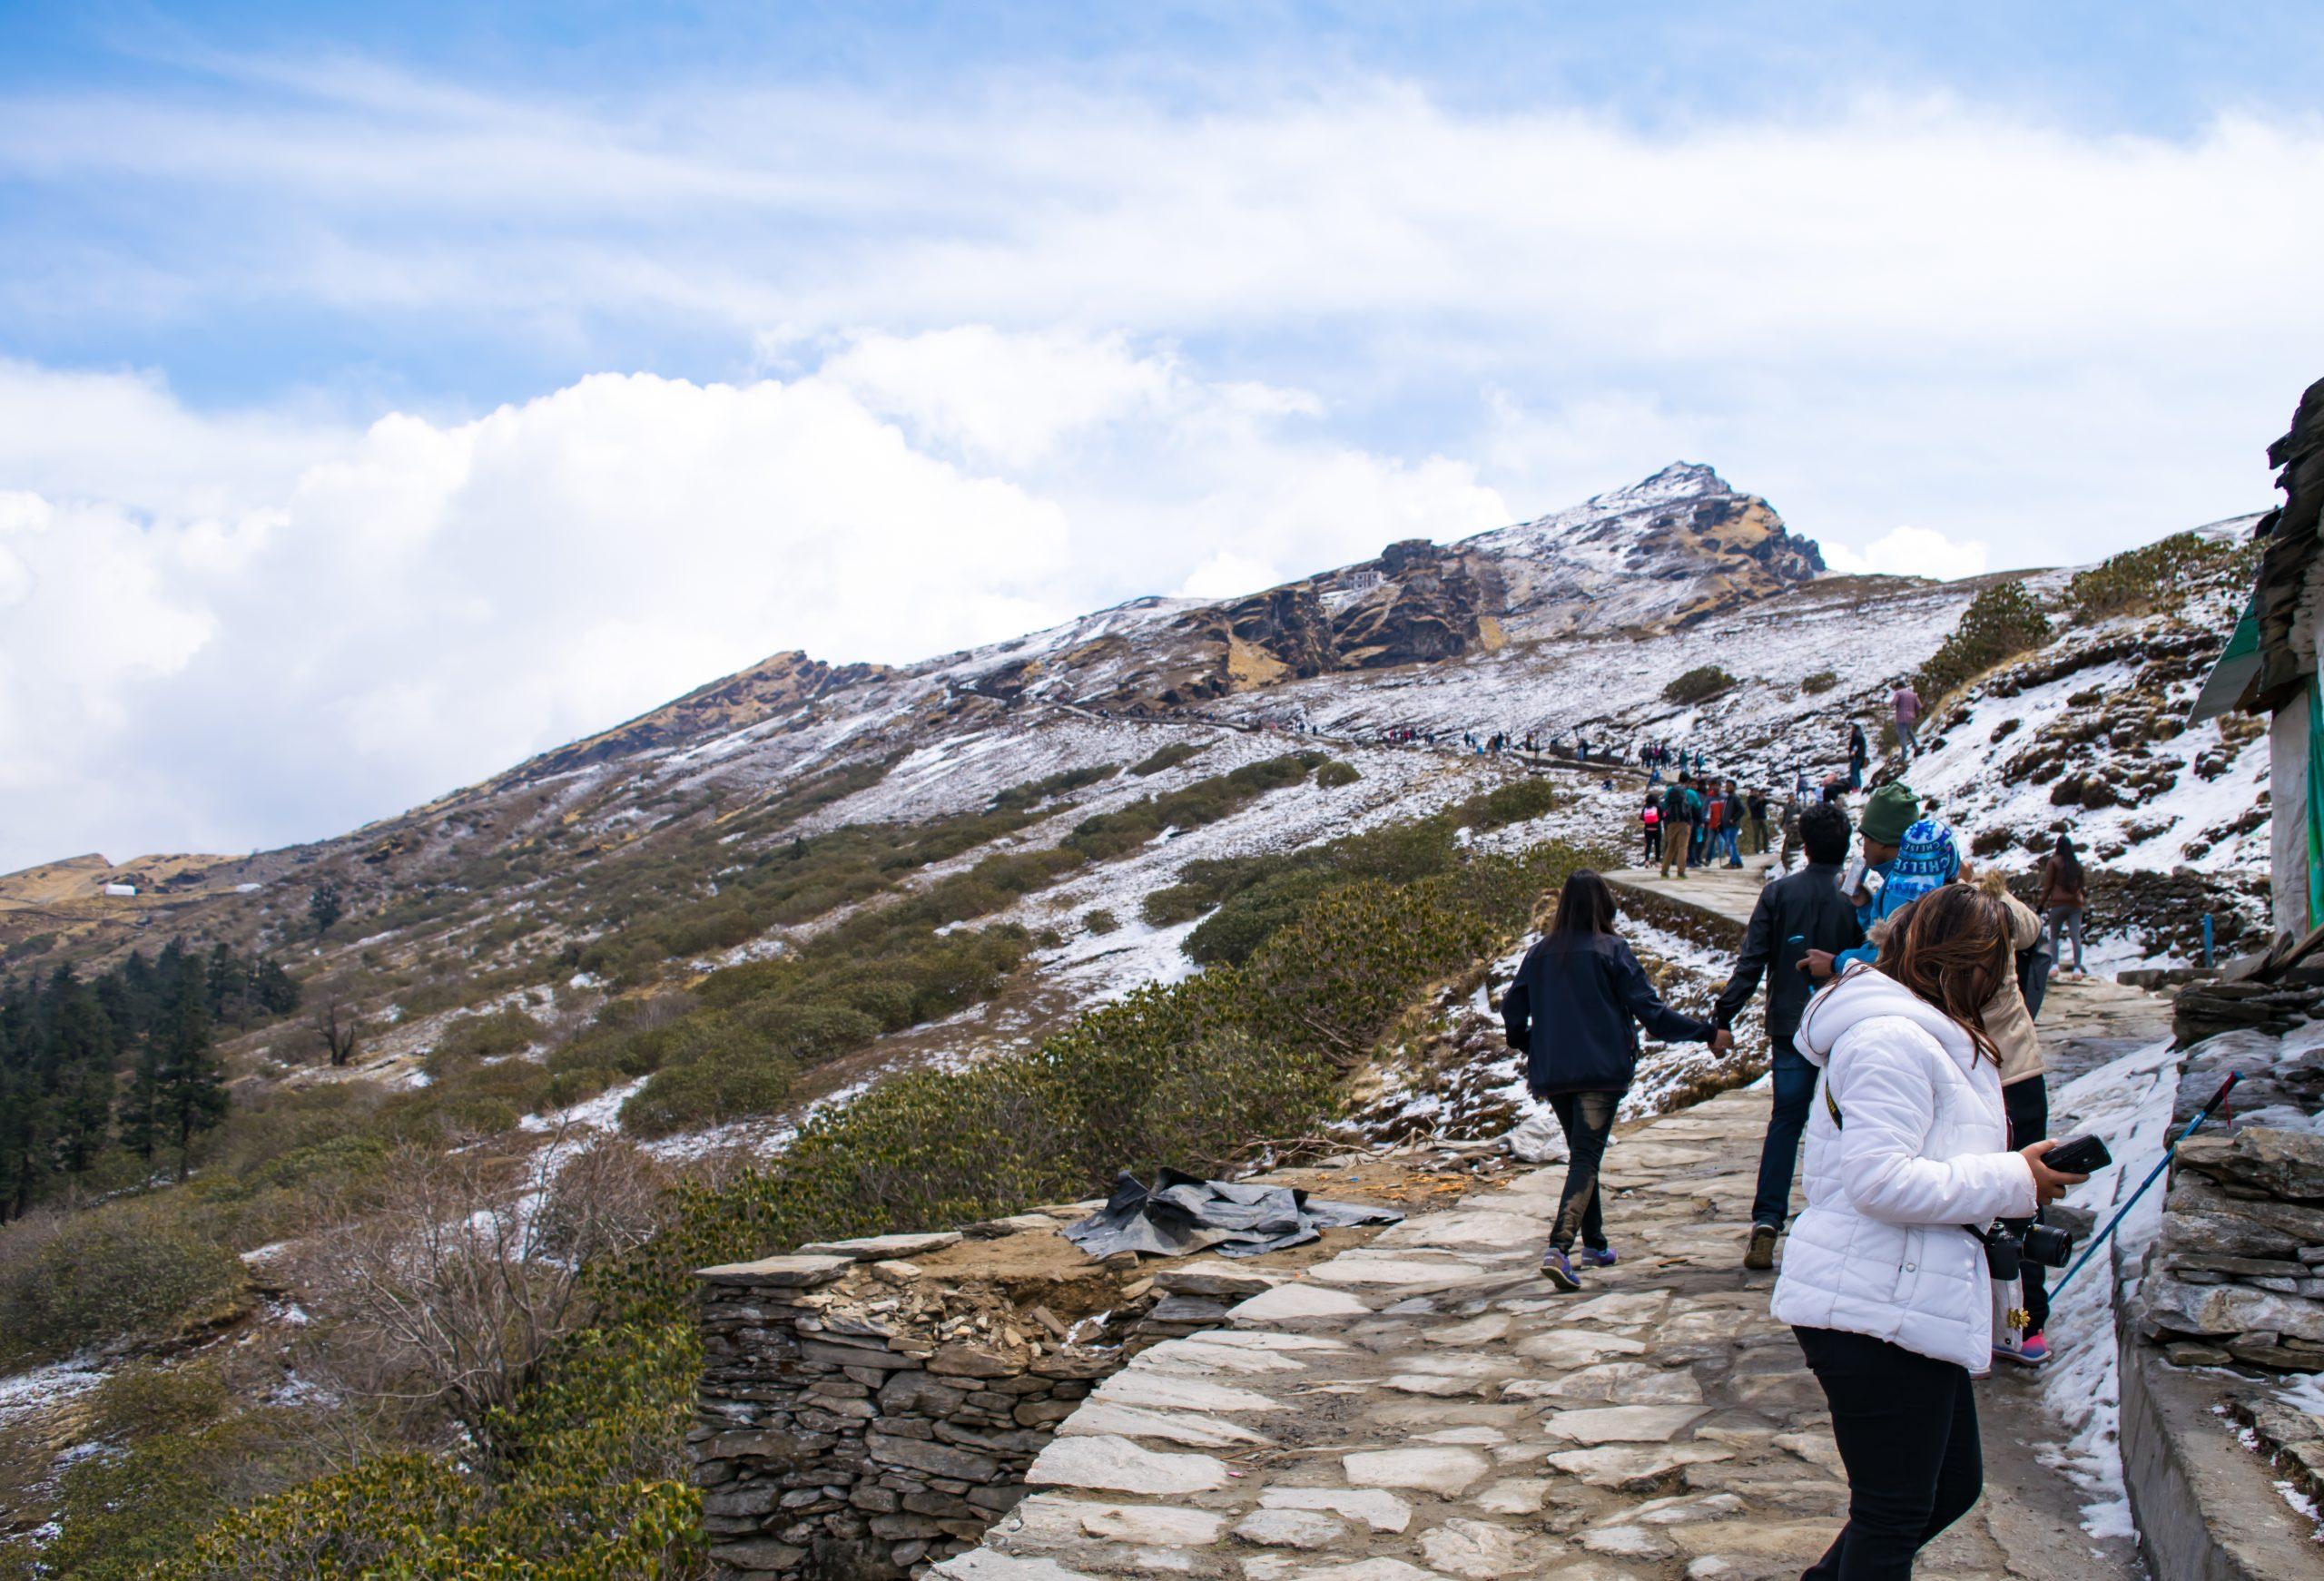 Trekkers heading to Chandrashila peak